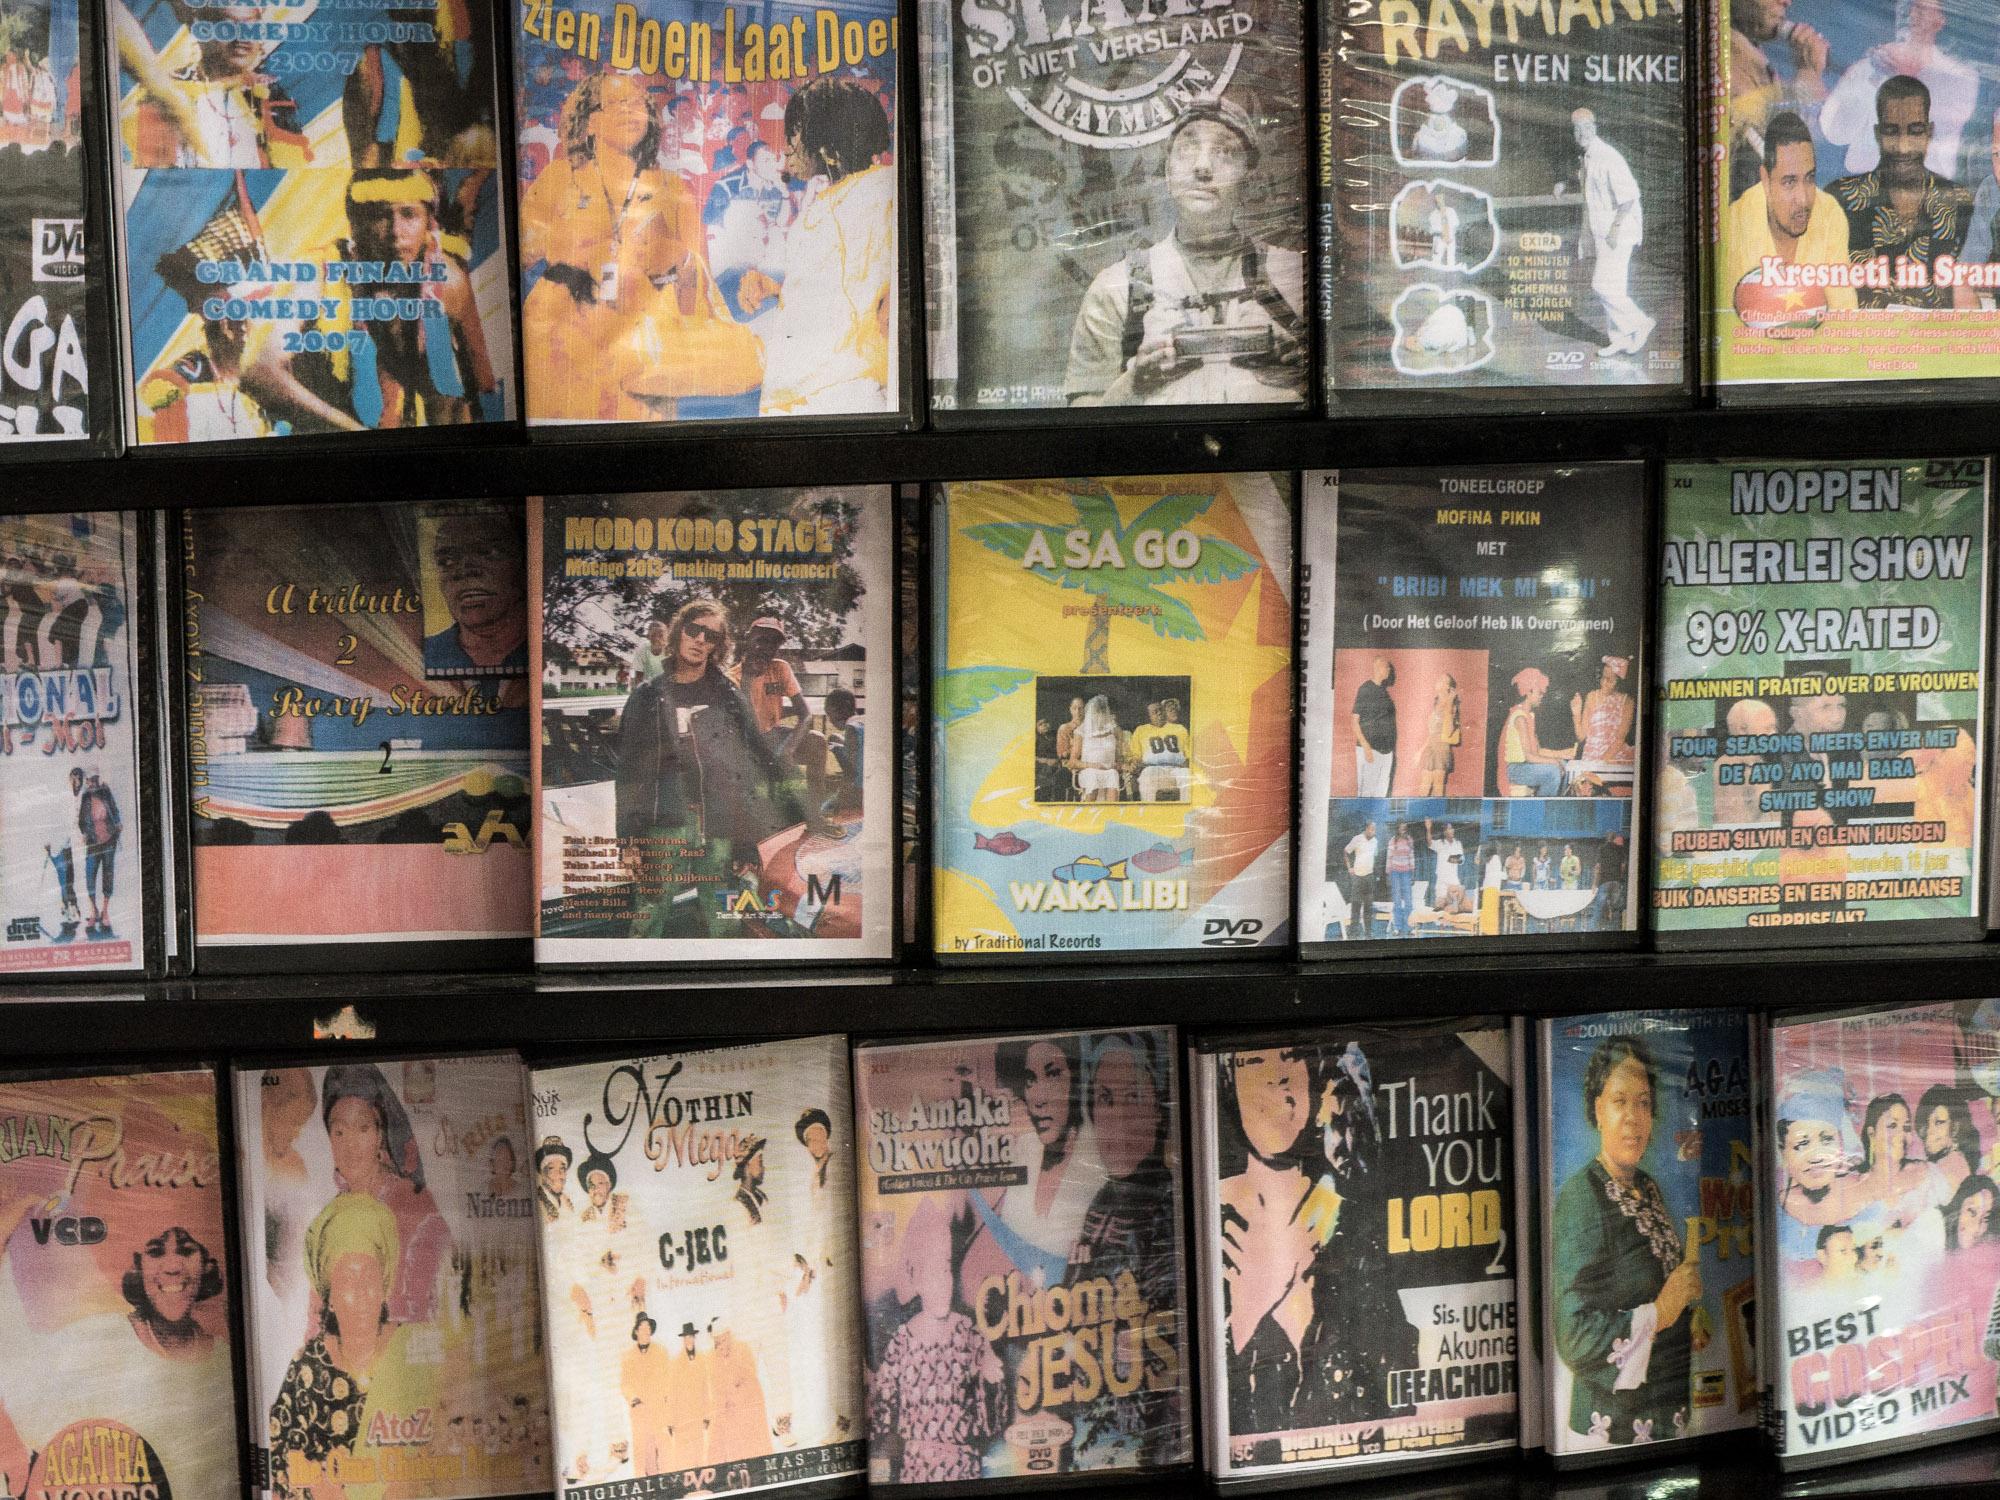 The Modo Kodo DVD between other Surinam made stuff